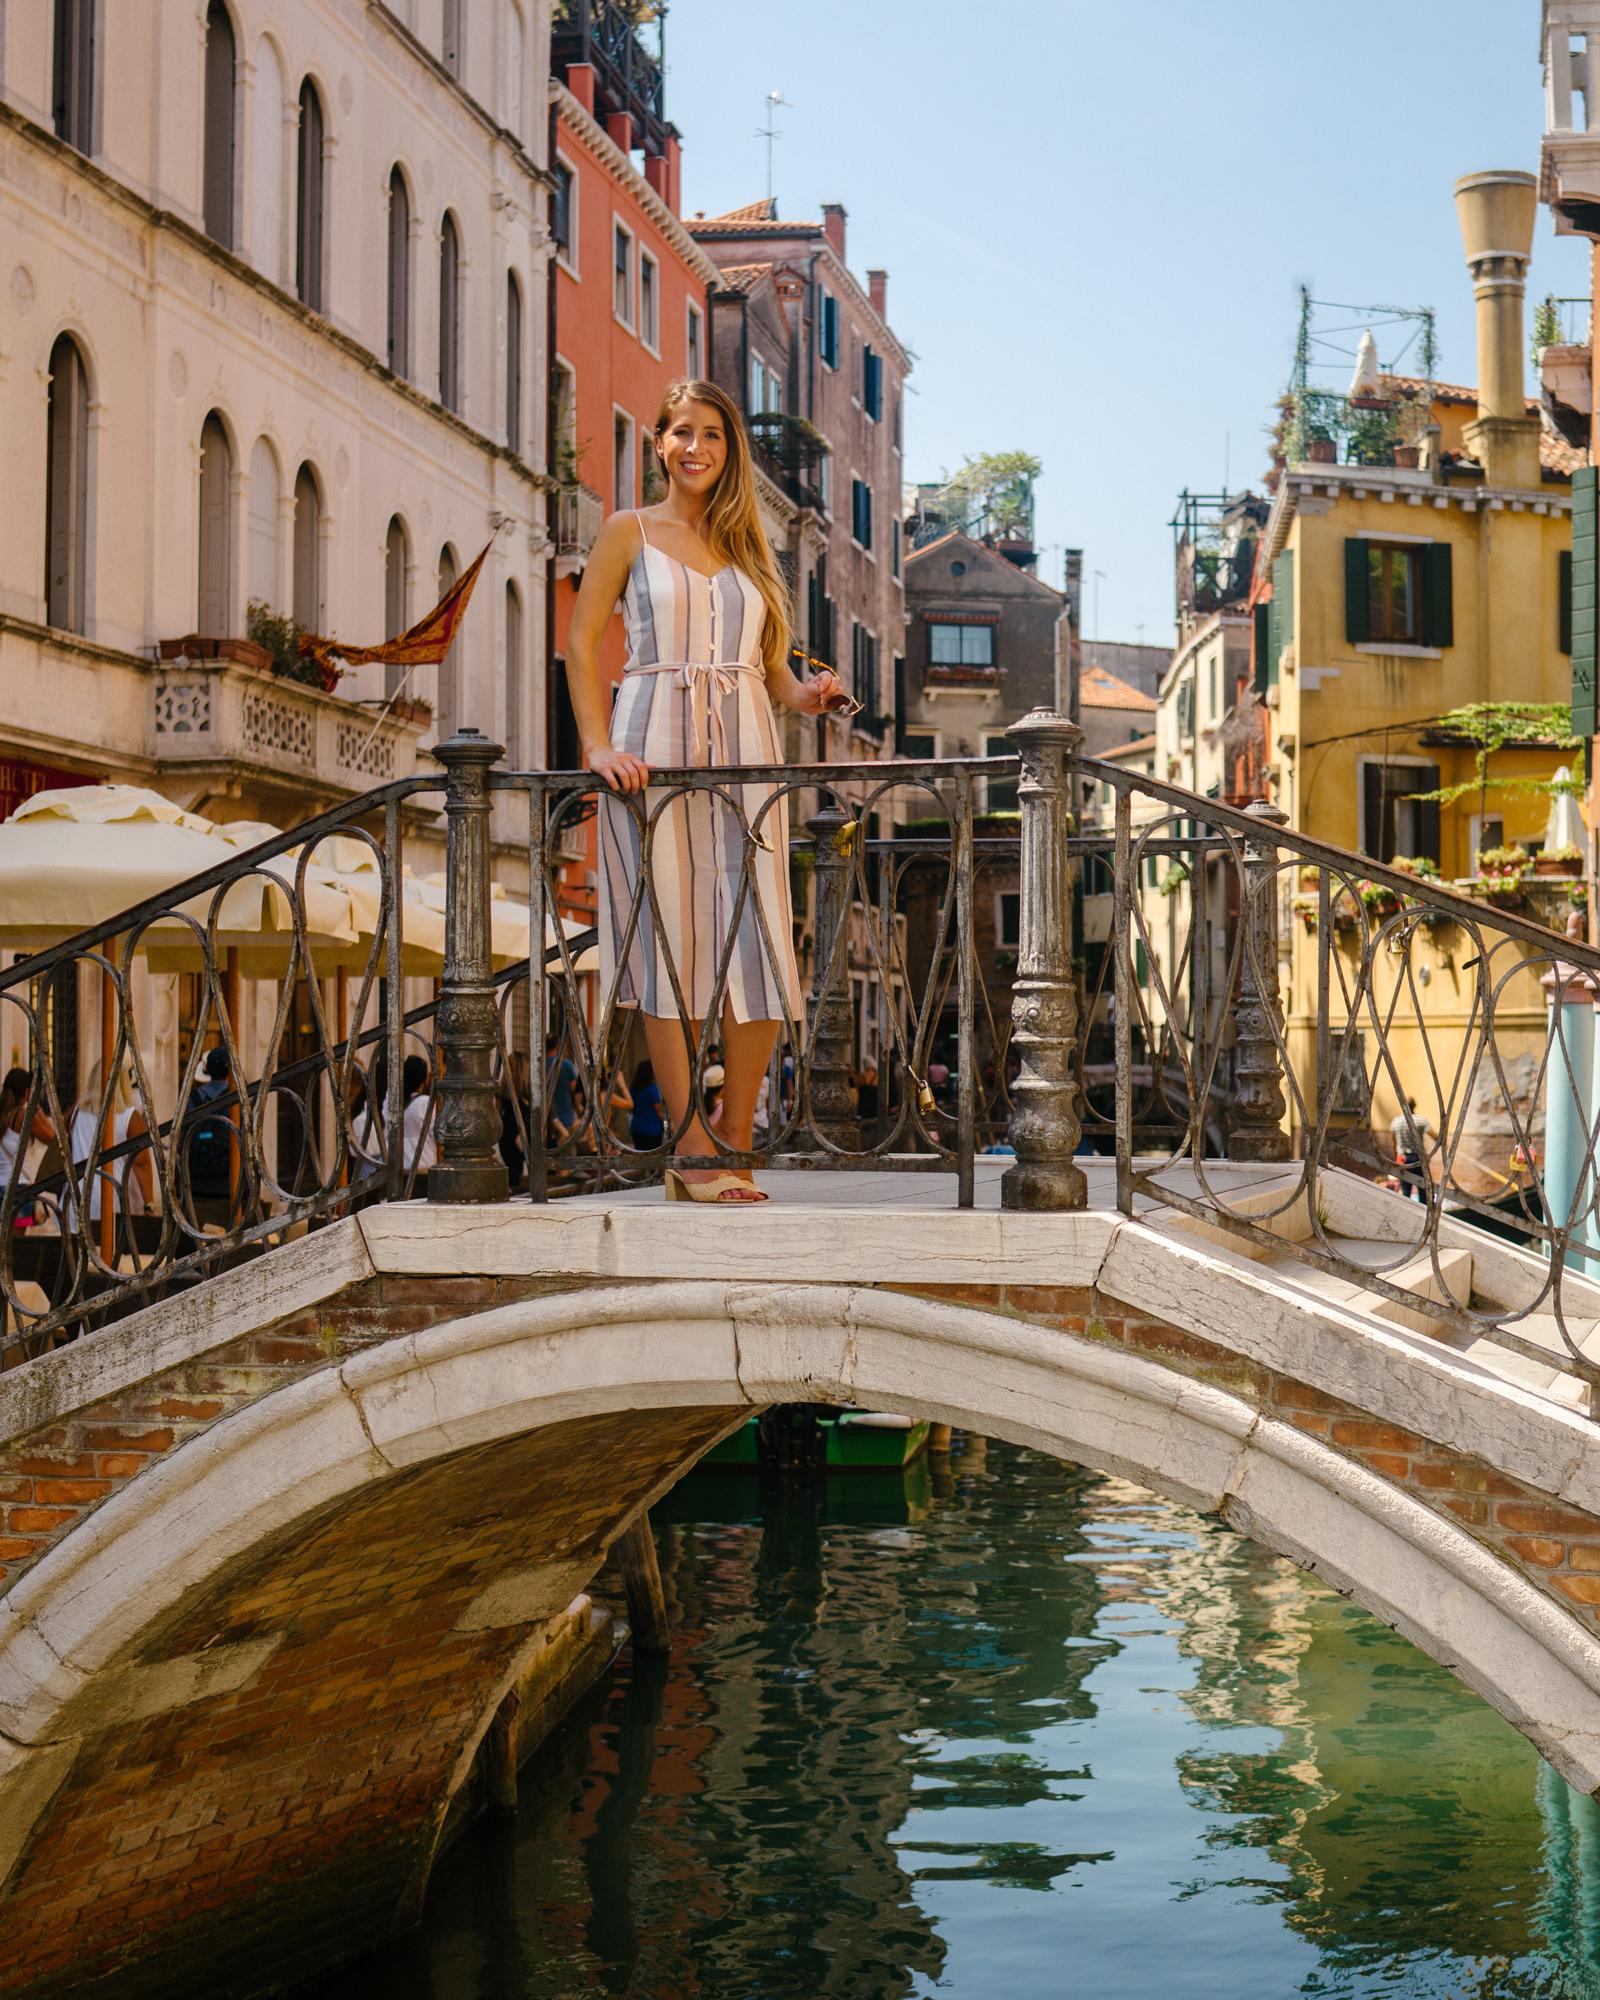 Prettiest bridges in Venice Italy